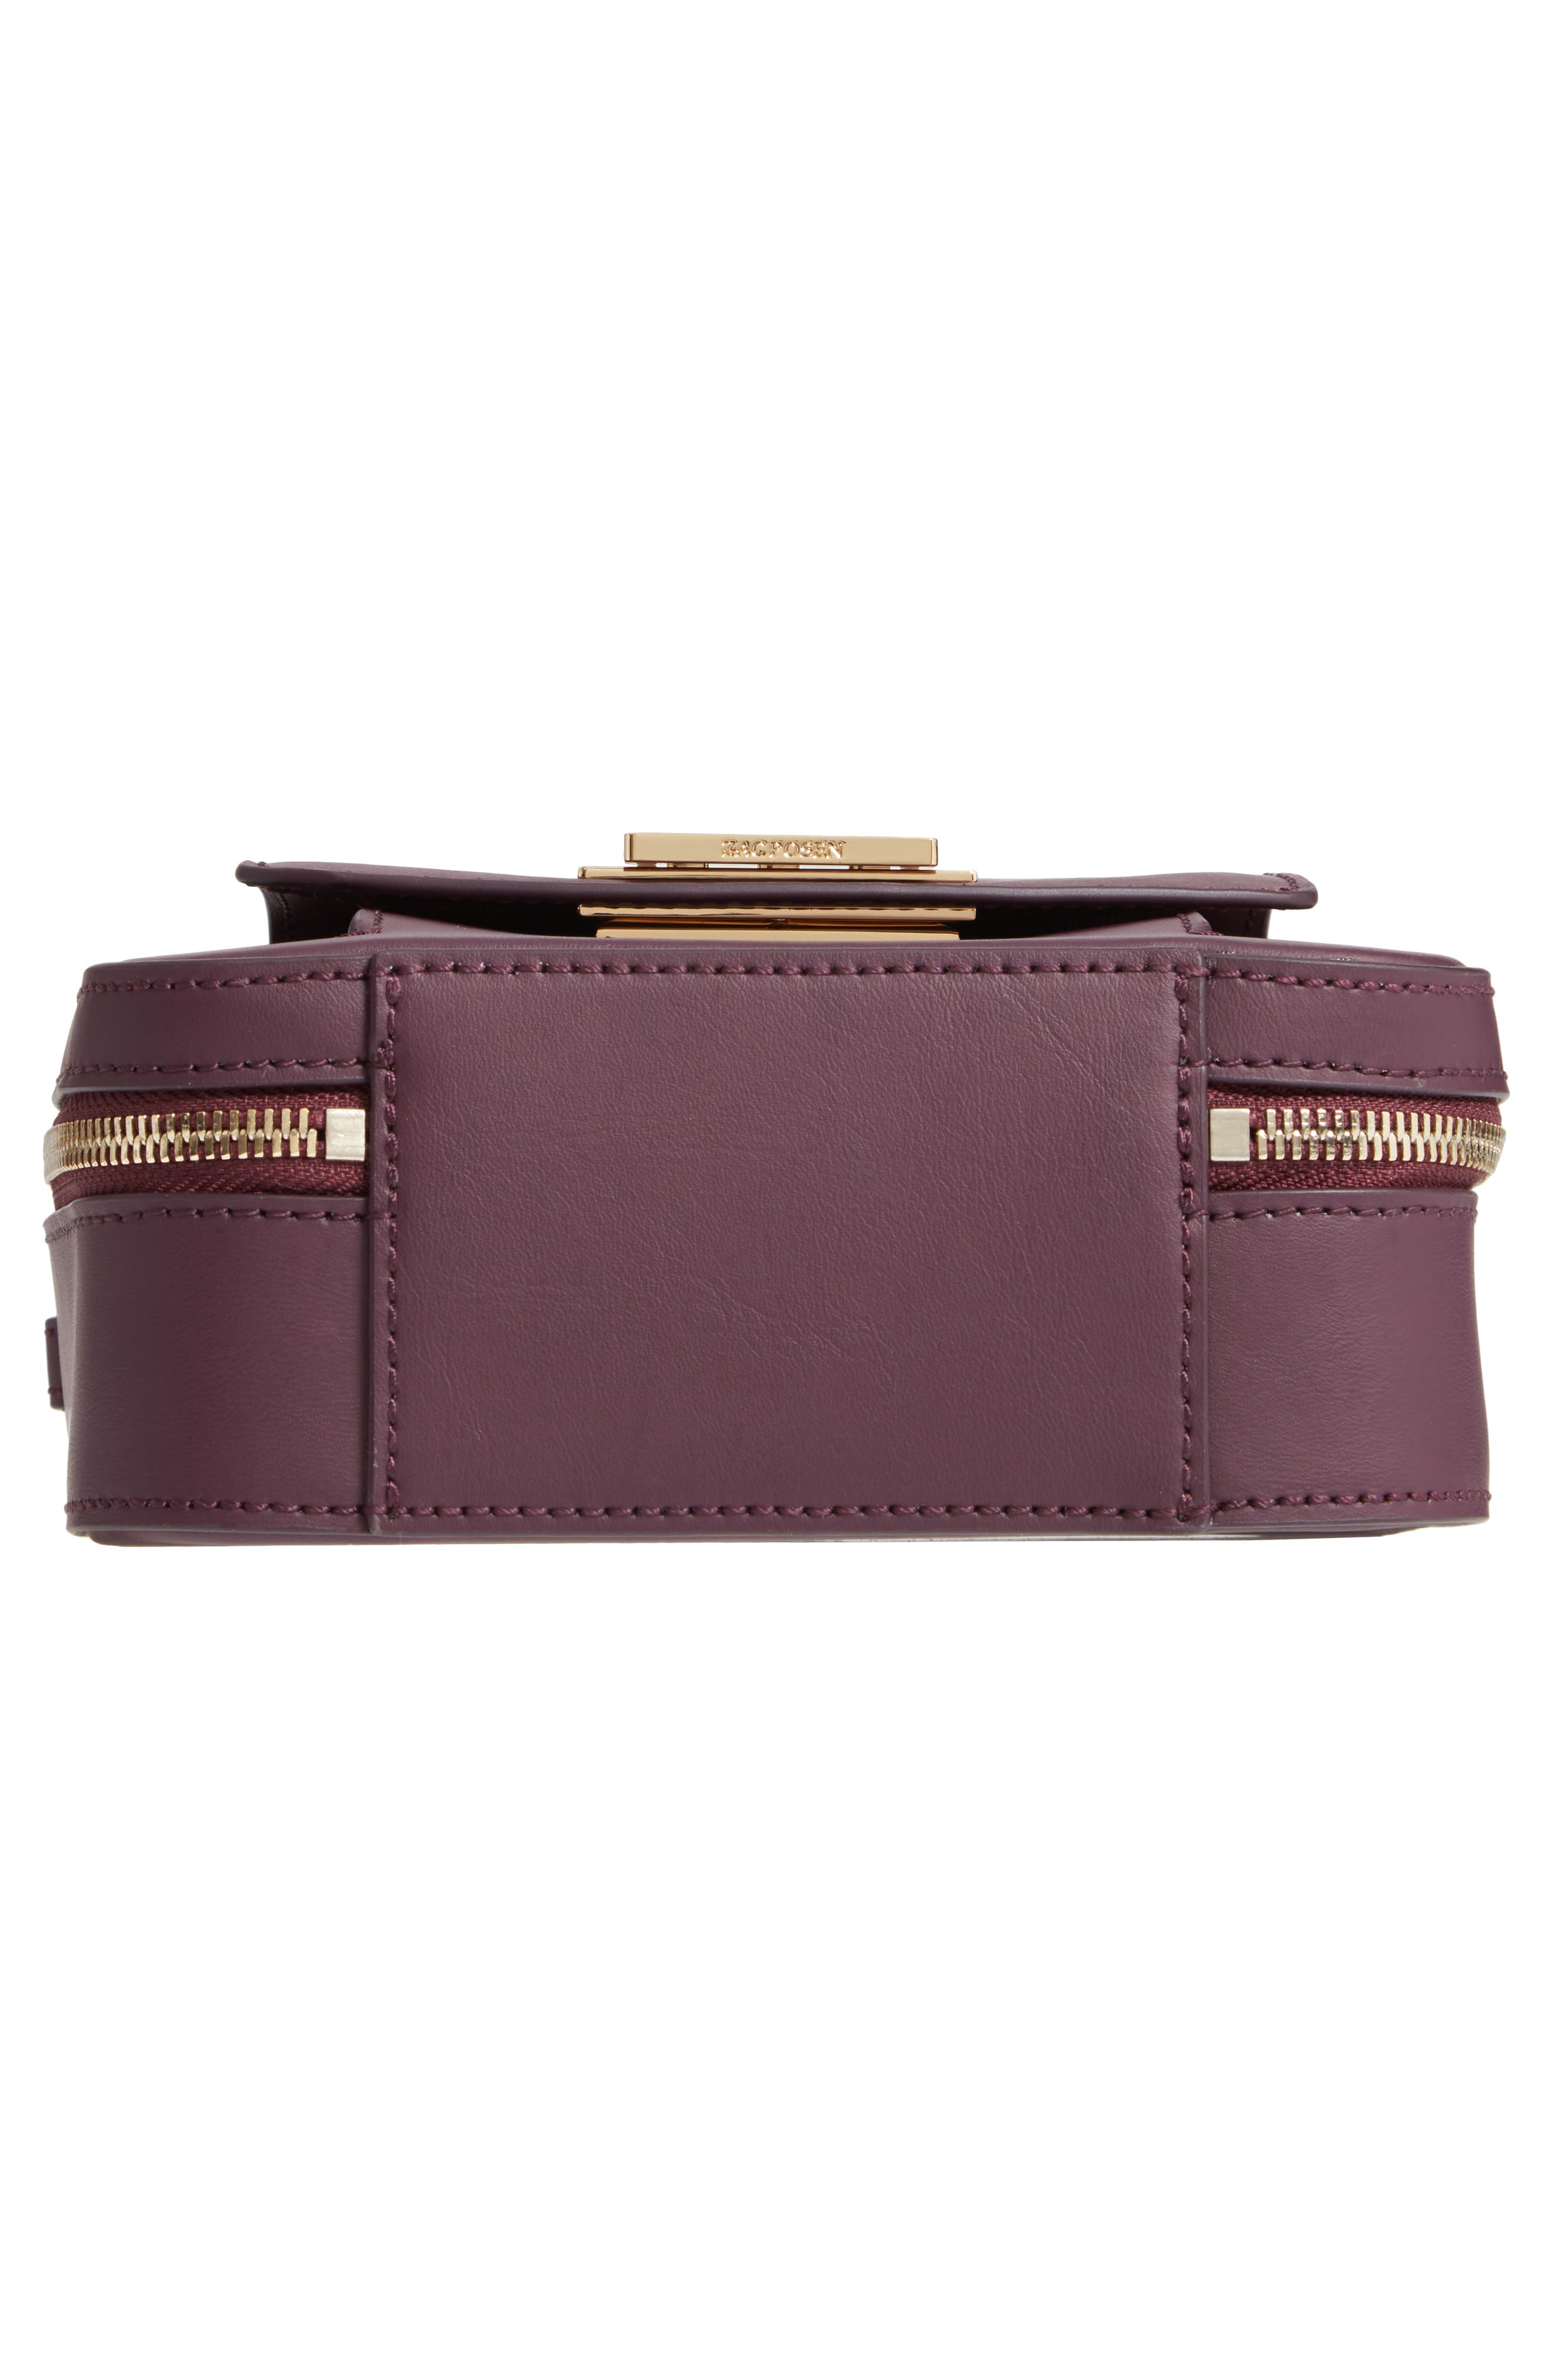 ZAC ZAC POSEN, Earthette Small Box Leather Crossbody Bag, Alternate thumbnail 6, color, 501